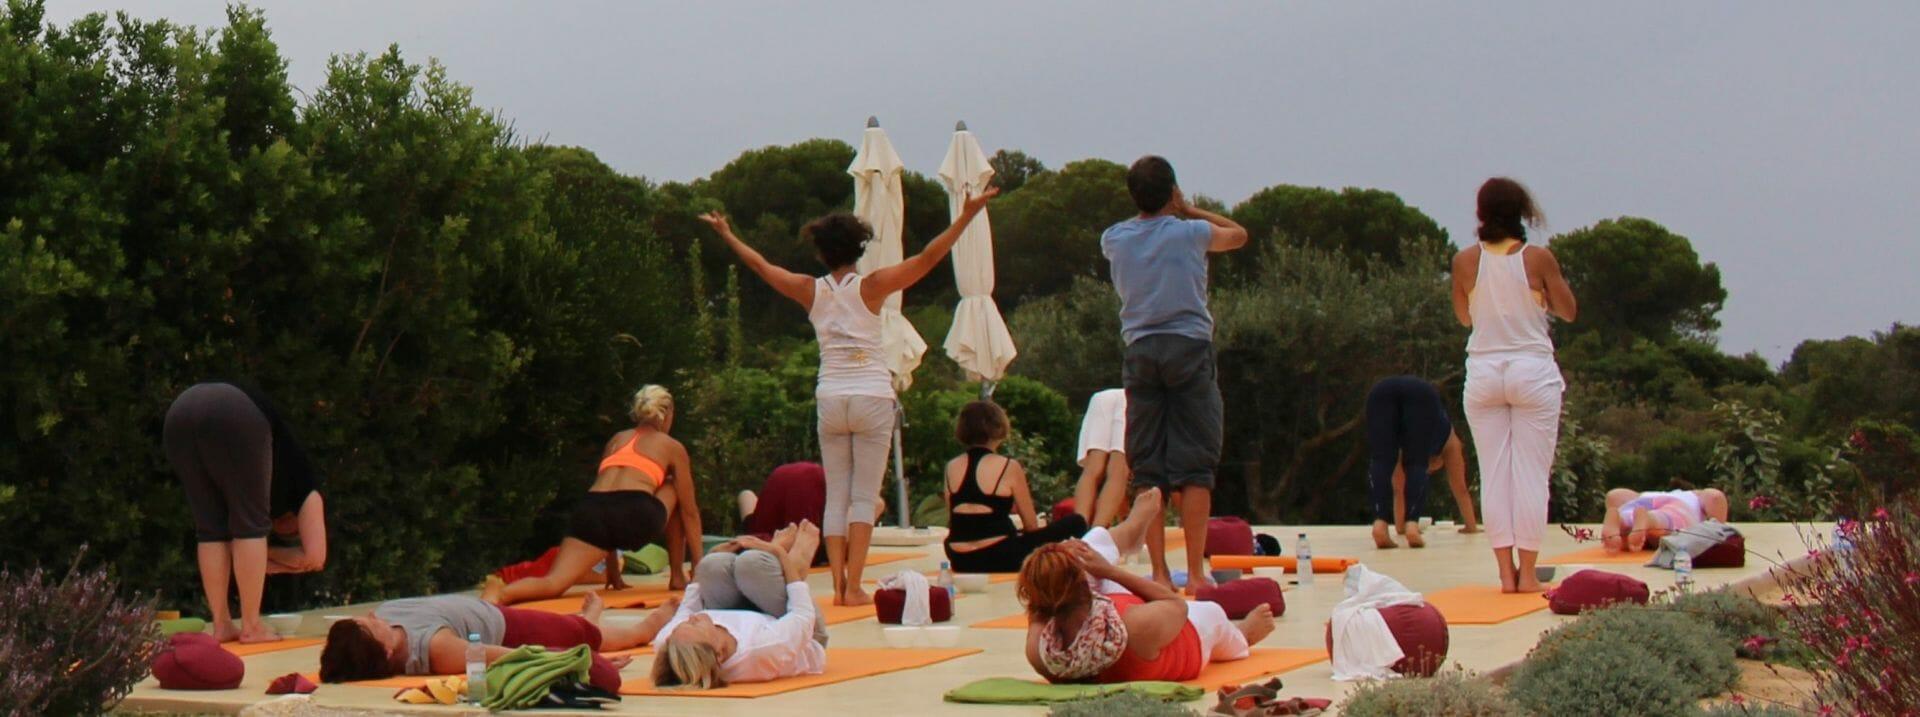 Yoga Retreat Gruppe praktiziert Sonnengrüße